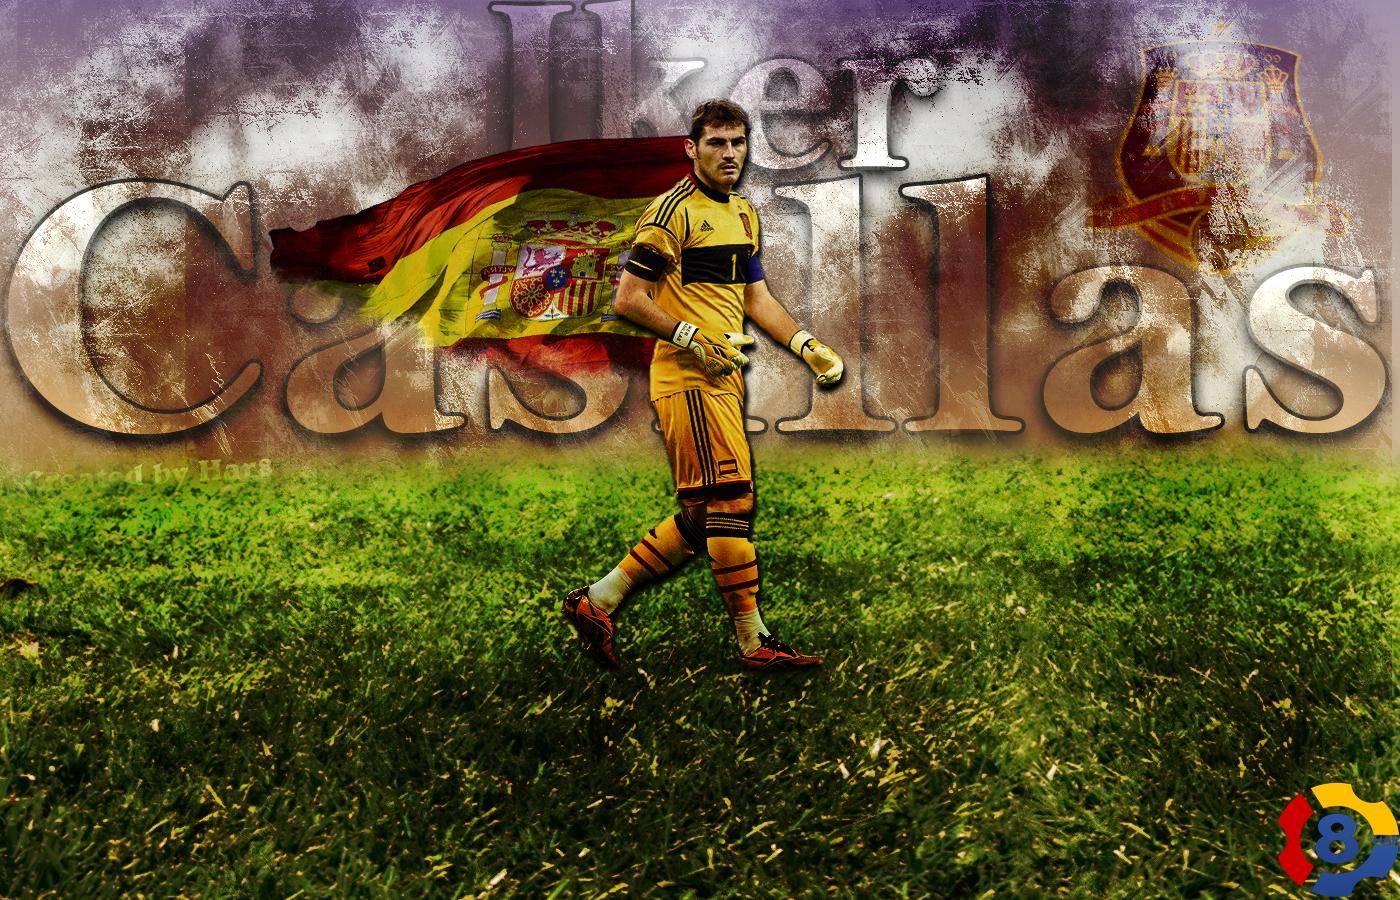 http://3.bp.blogspot.com/-zRl2ZxAWuU8/TsJLZHiWgNI/AAAAAAAAAiQ/F384SZgHEeU/s1600/Casillas.jpg